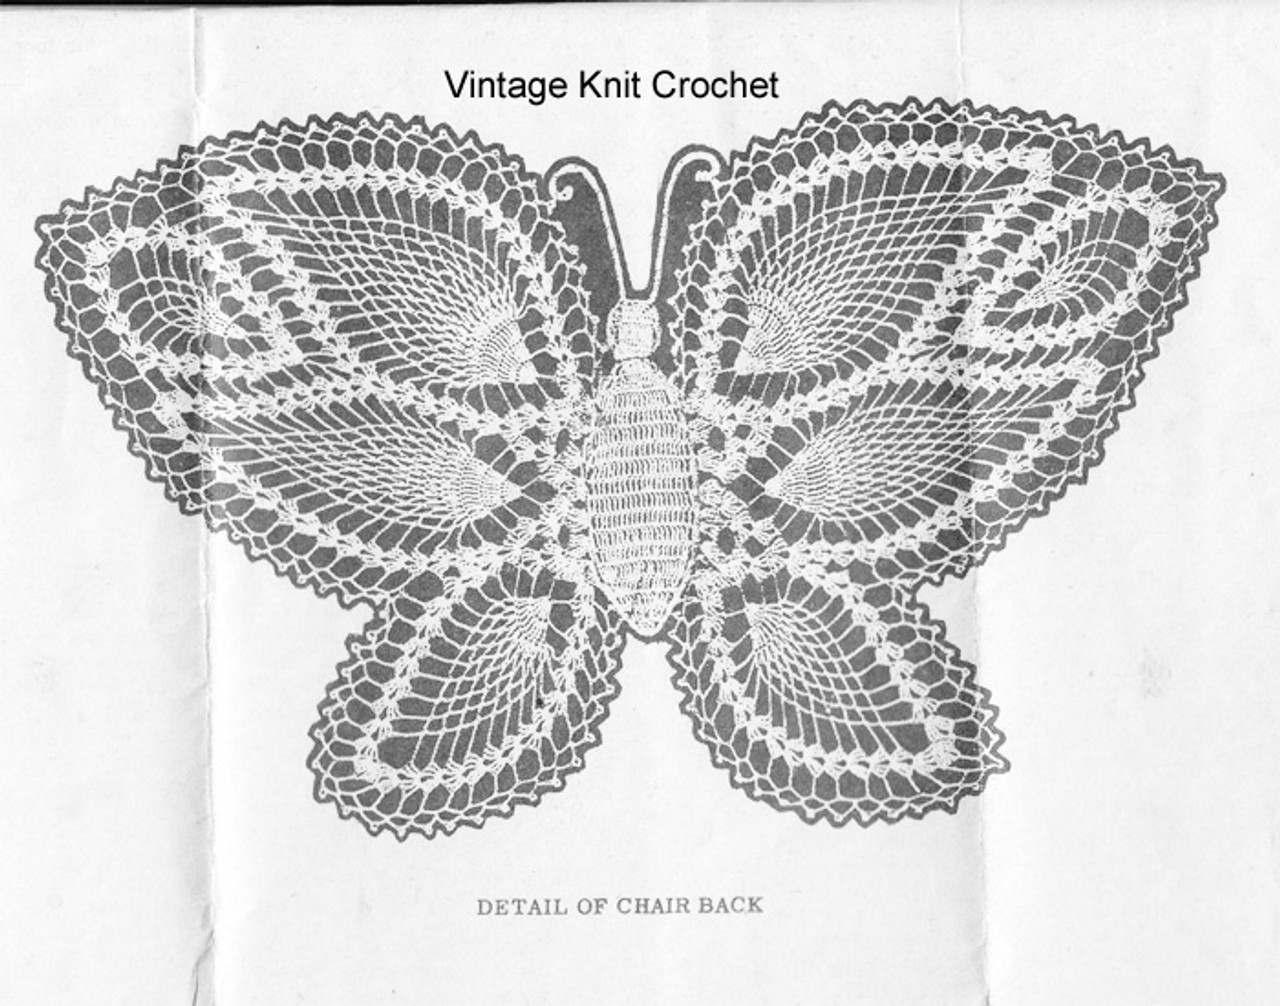 Butterfly Crochet Pattern Stitch Illustration for Design 828